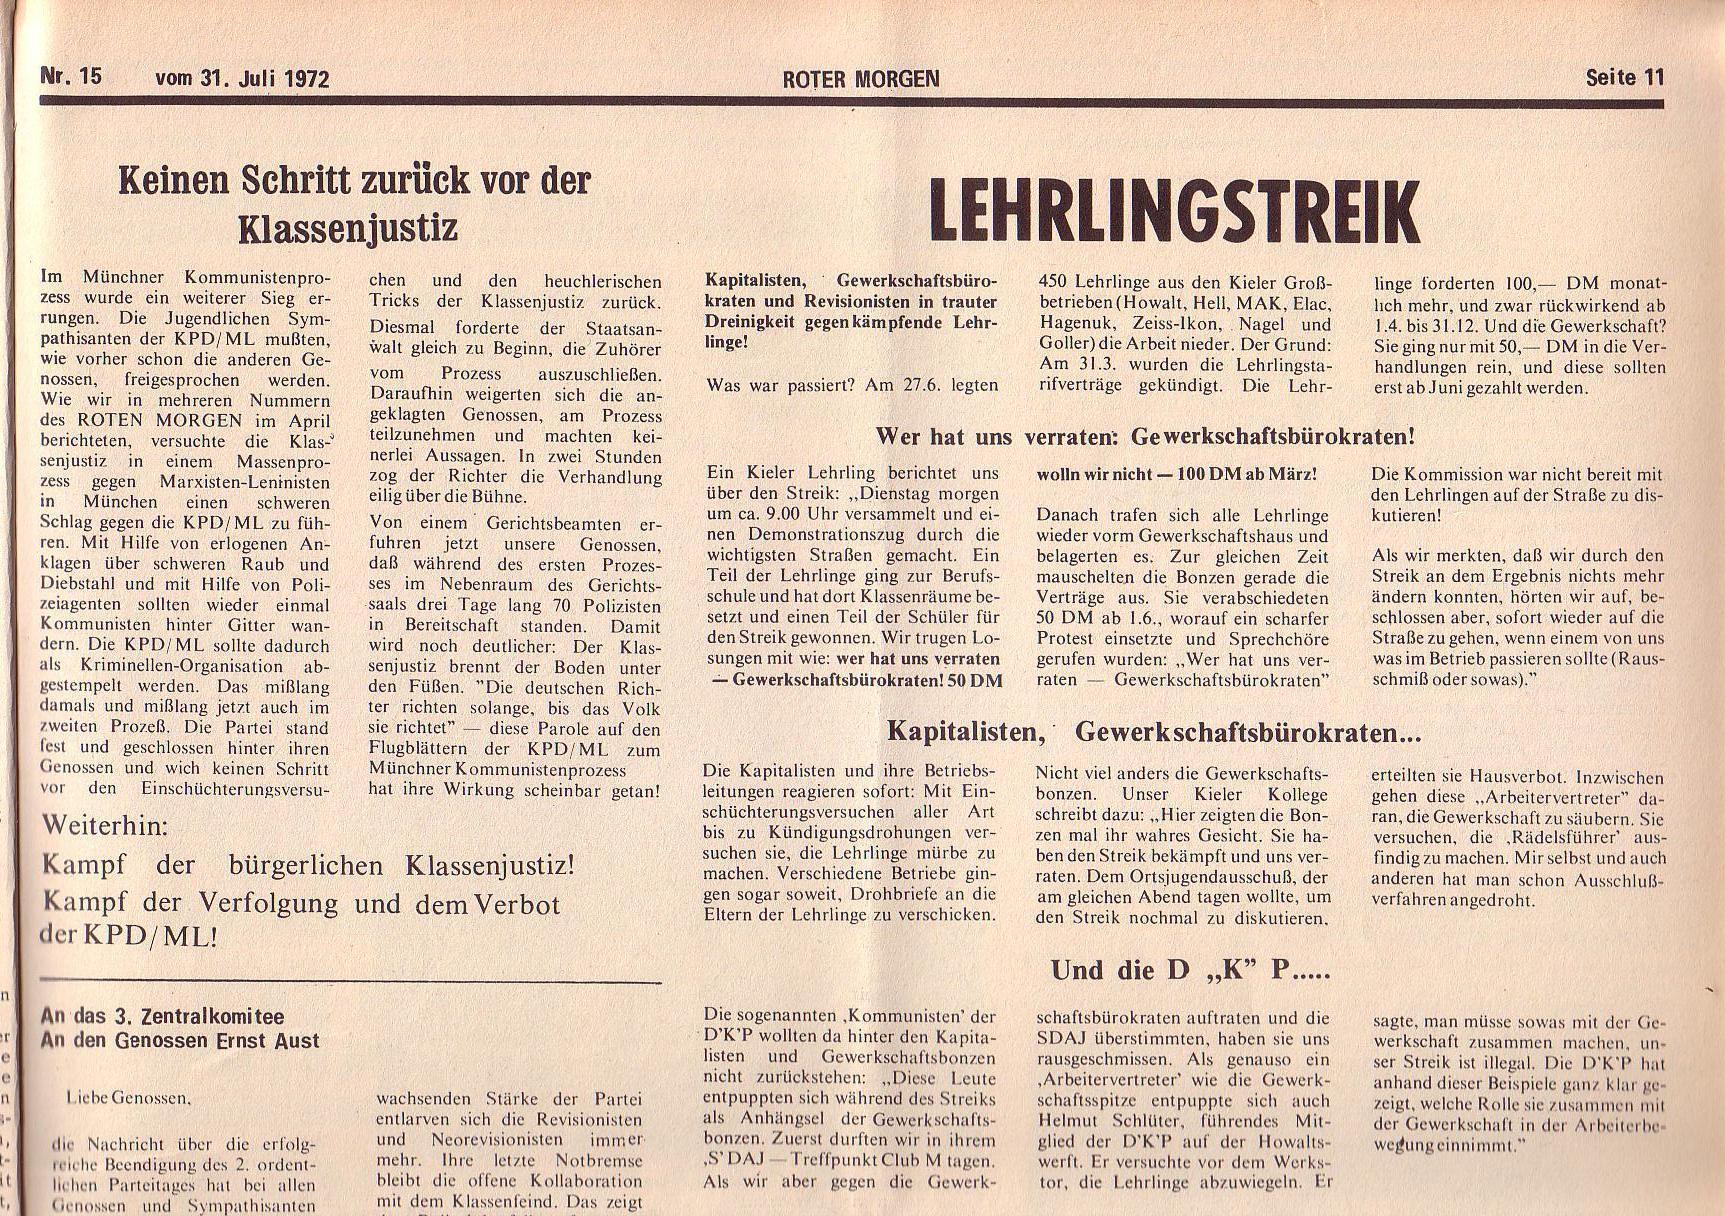 Roter Morgen, 6. Jg., 31. Juli 1972, Nr. 15, Seite 11a